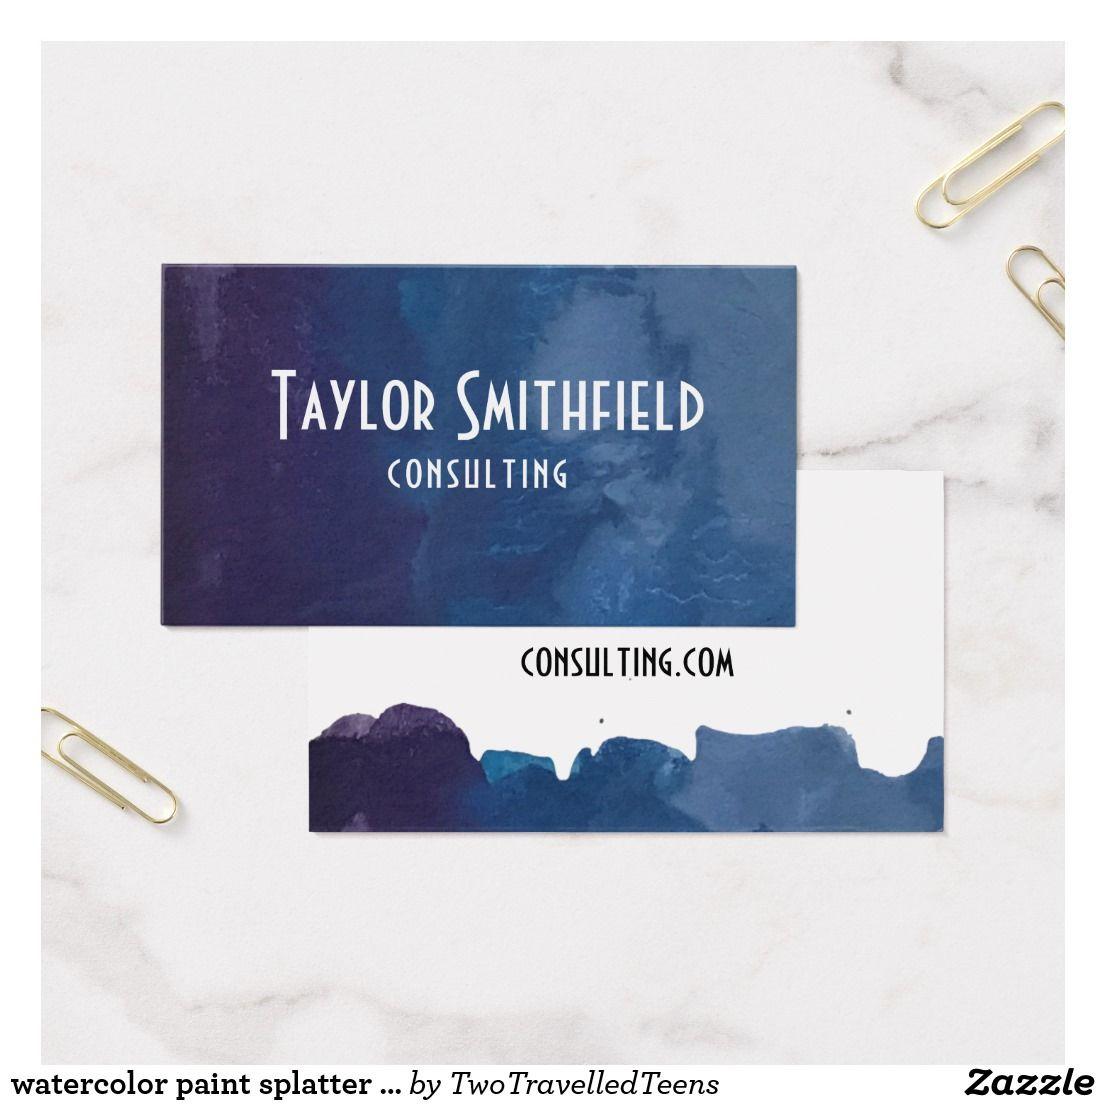 Watercolor paint splatter swirl business card   Business cards